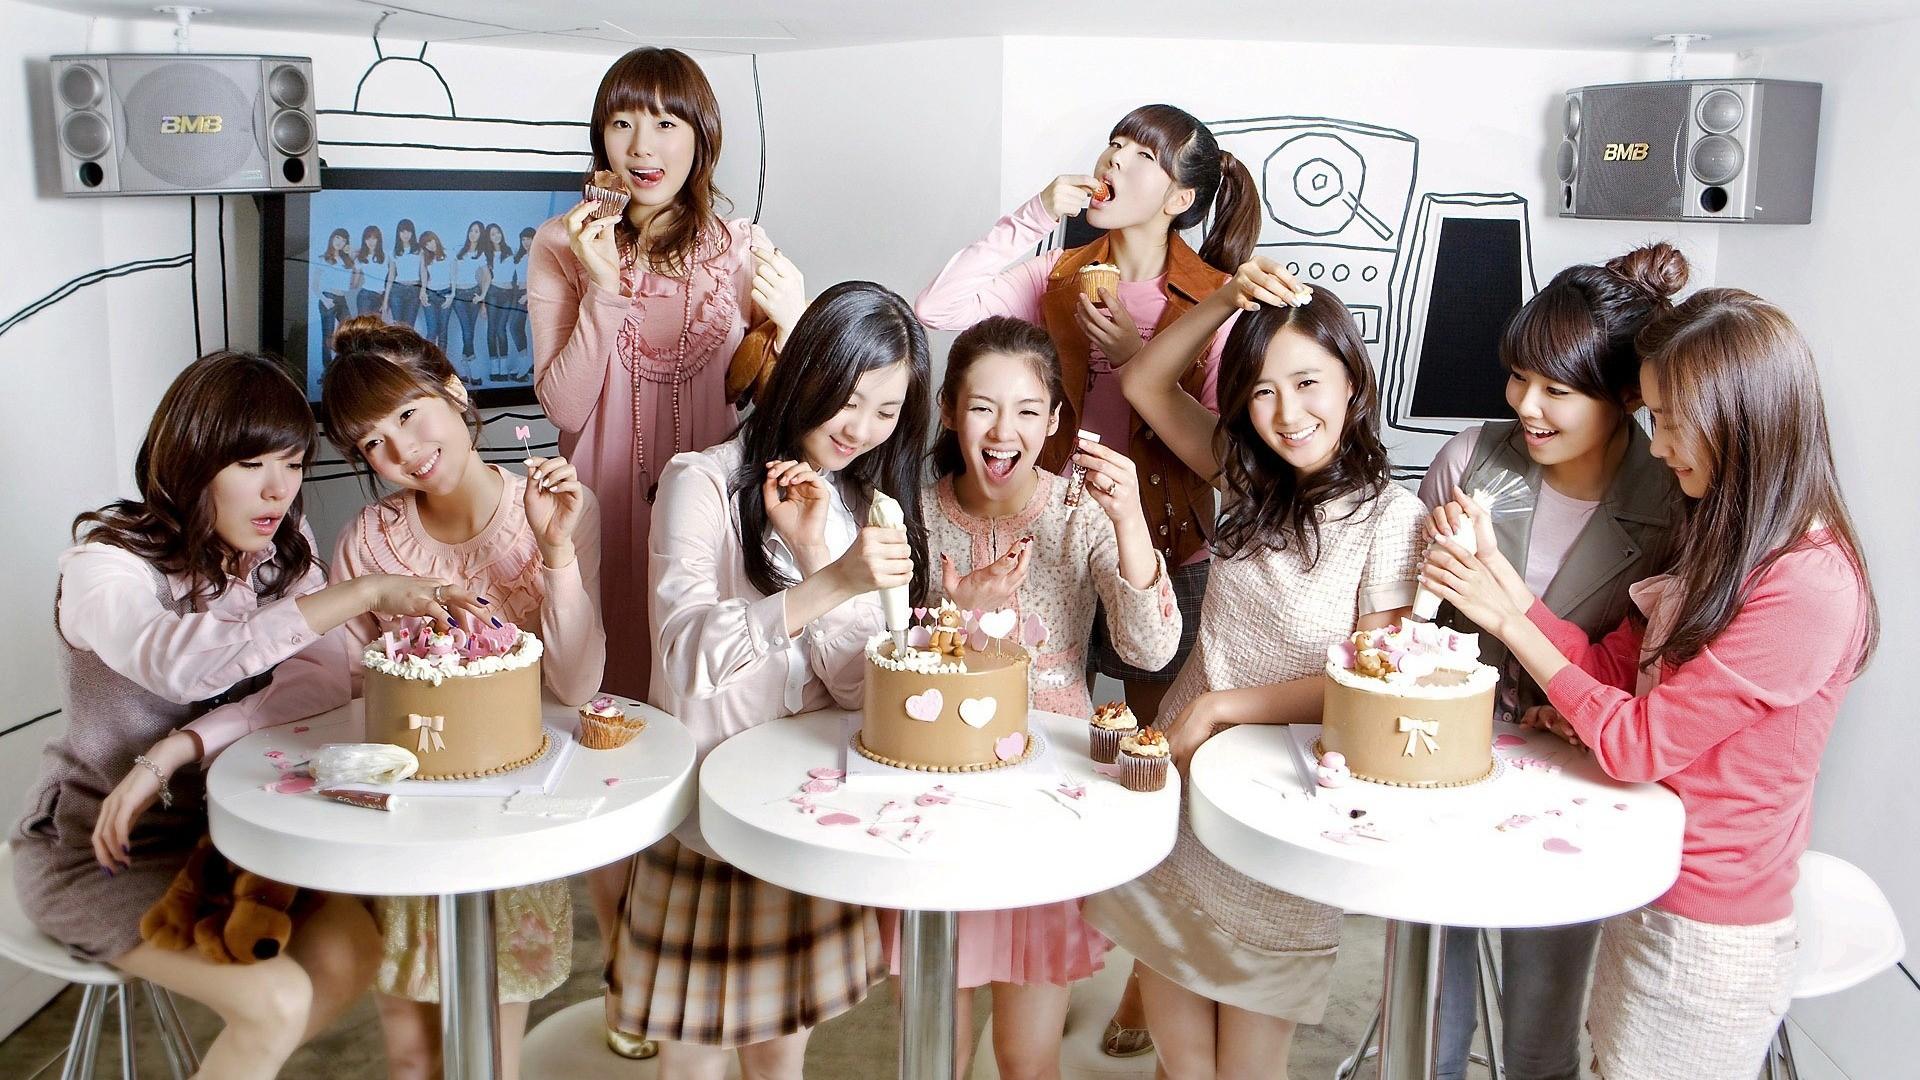 People 1920x1080 SNSD Girls' Generation Kim Taeyeon Lee Soonkyu Sunny Yoona Im Yoona Kim Hyoyeon Seohyun Tiffany Hwang Kwon Yuri Jessica Jung Choi Sooyoung women Asian group of women pies smiling